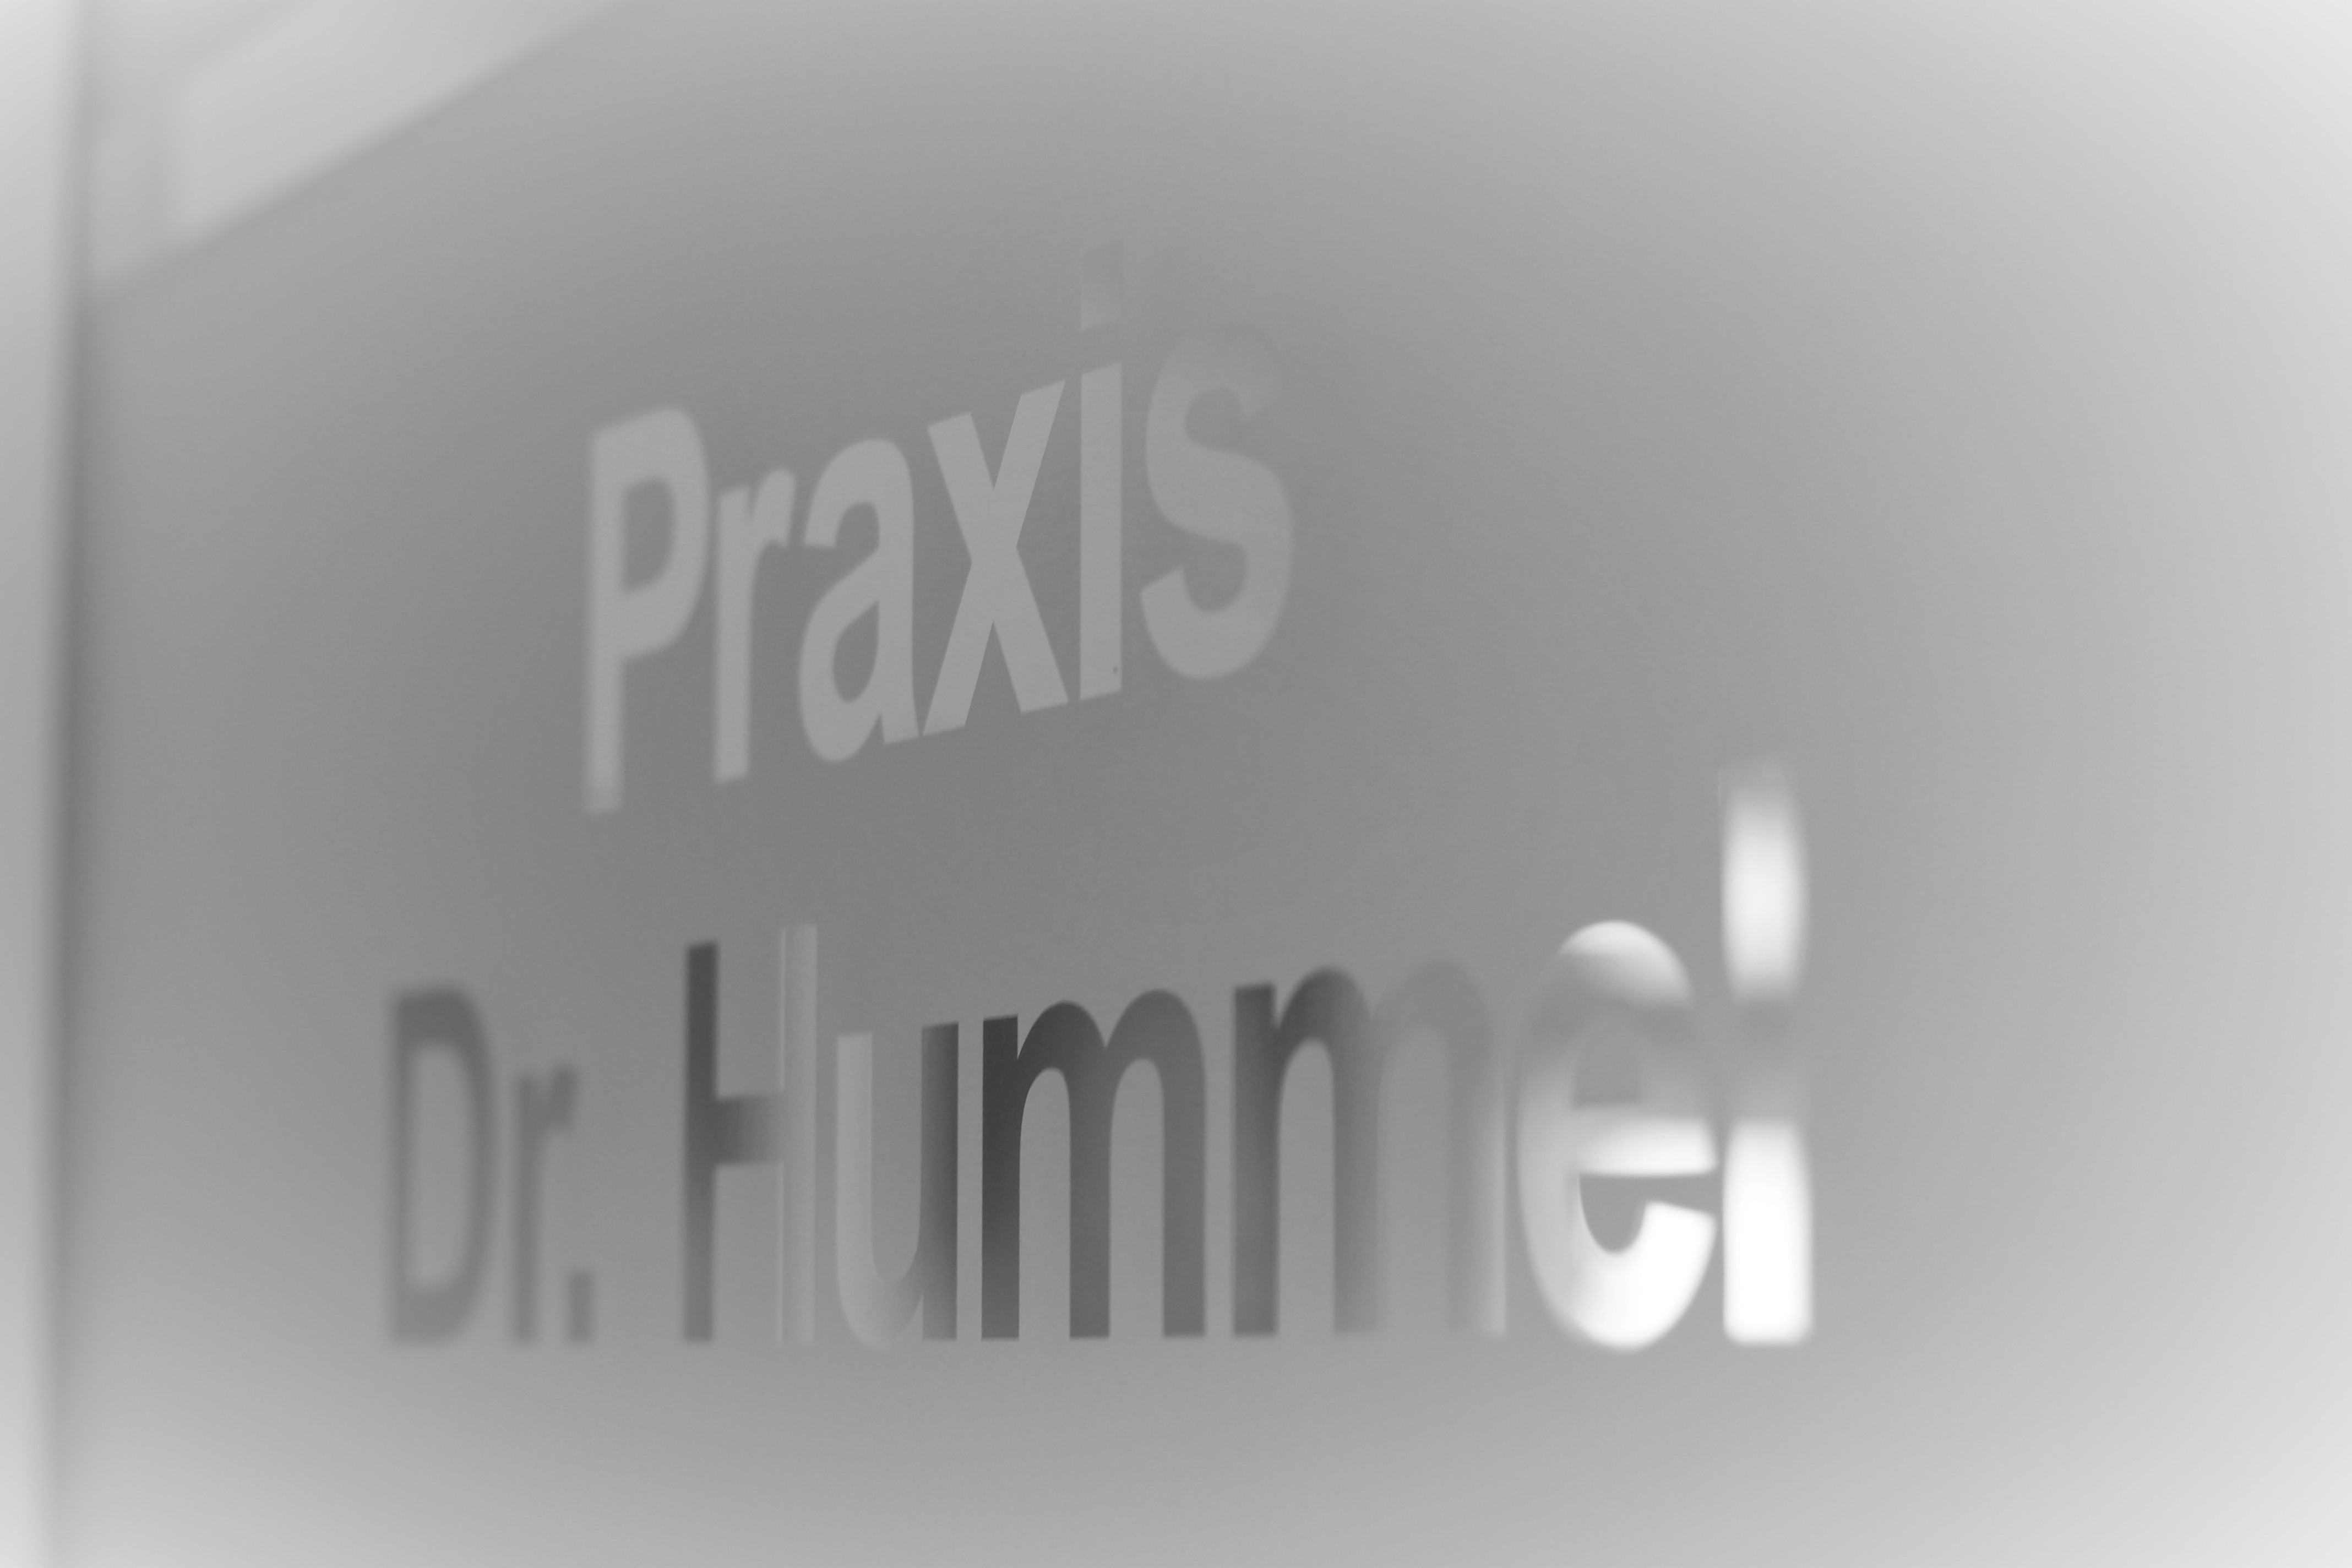 2017_Praxisshooting Dr. Hummel Geraete Diverses (8)